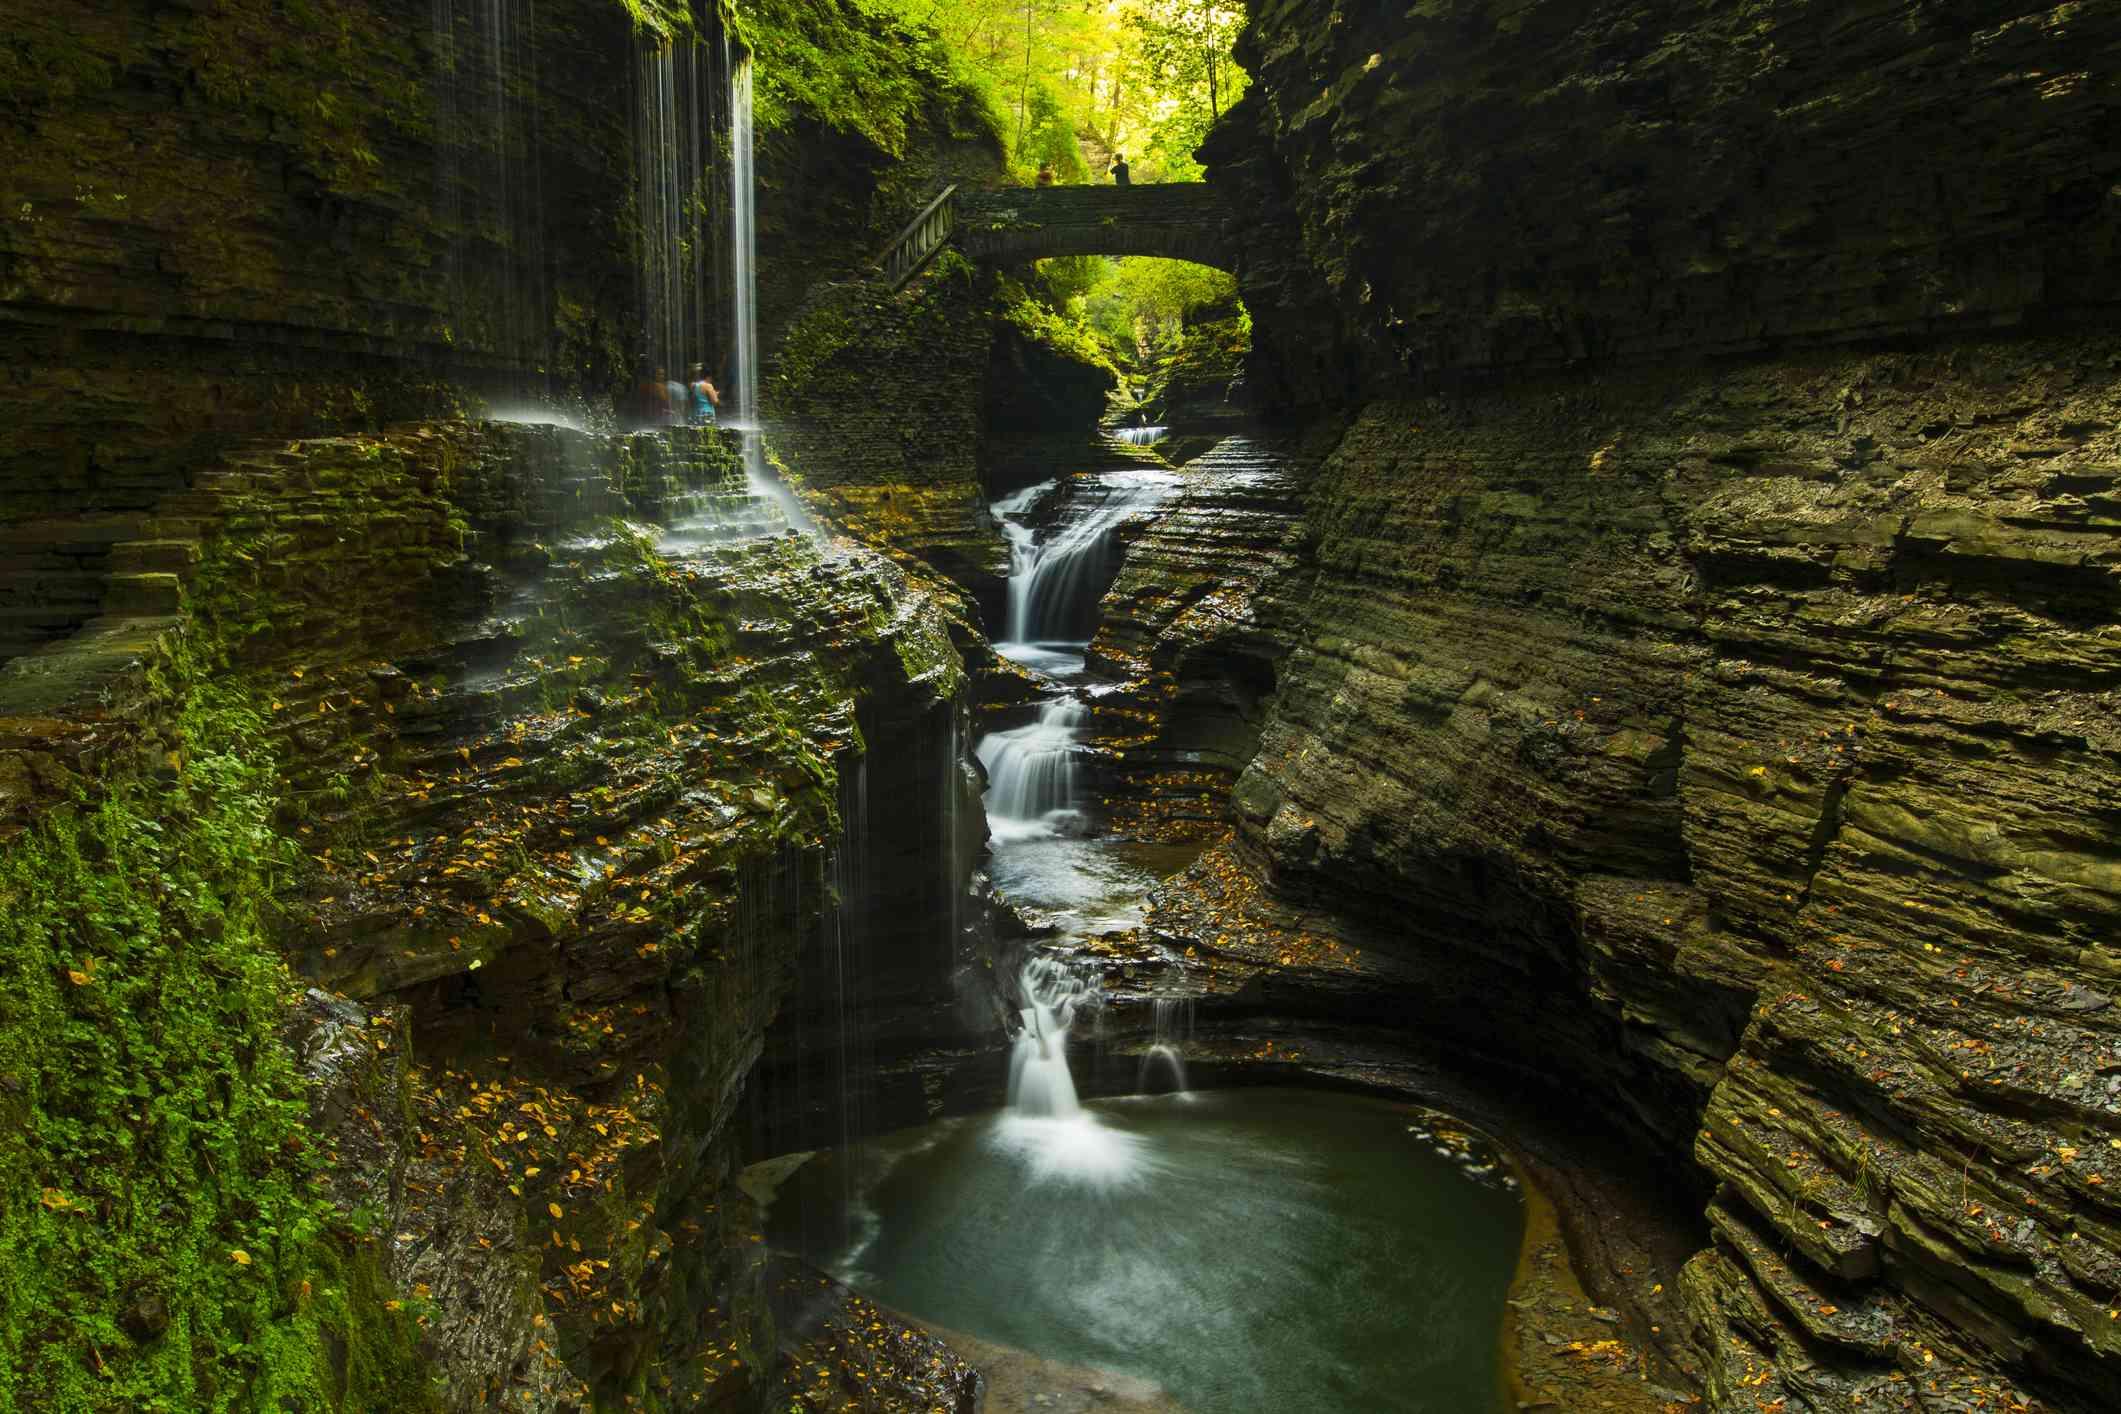 Gorge waterfall in Watkins Glen State Park